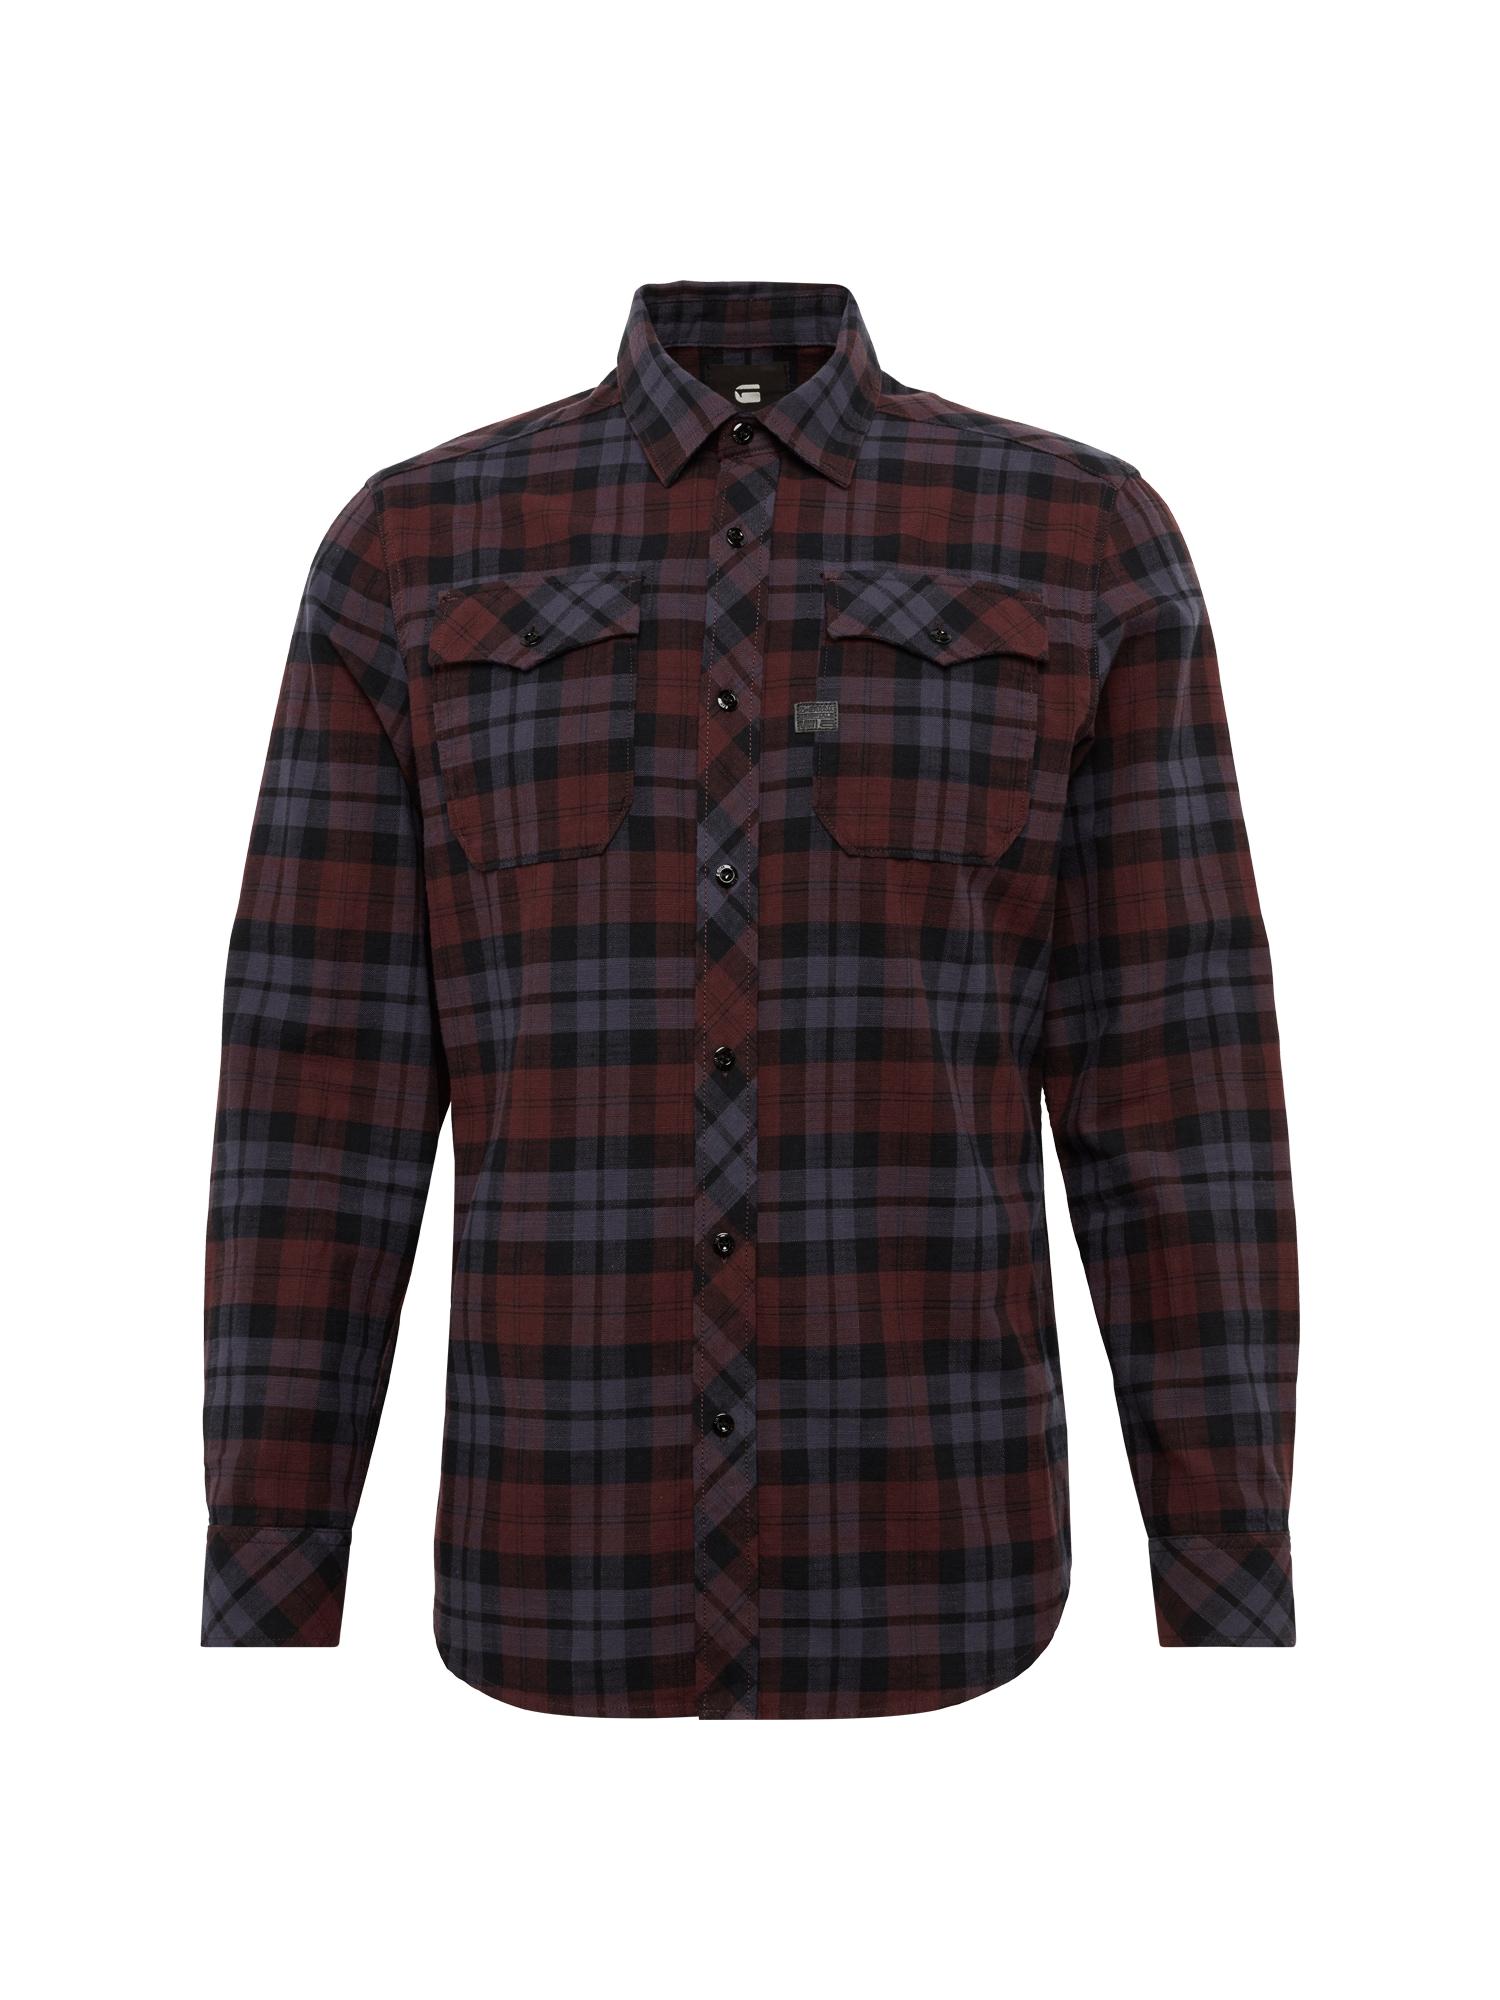 G-STAR RAW Heren Overhemd Landoh Shirt l s donkerblauw wijnrood